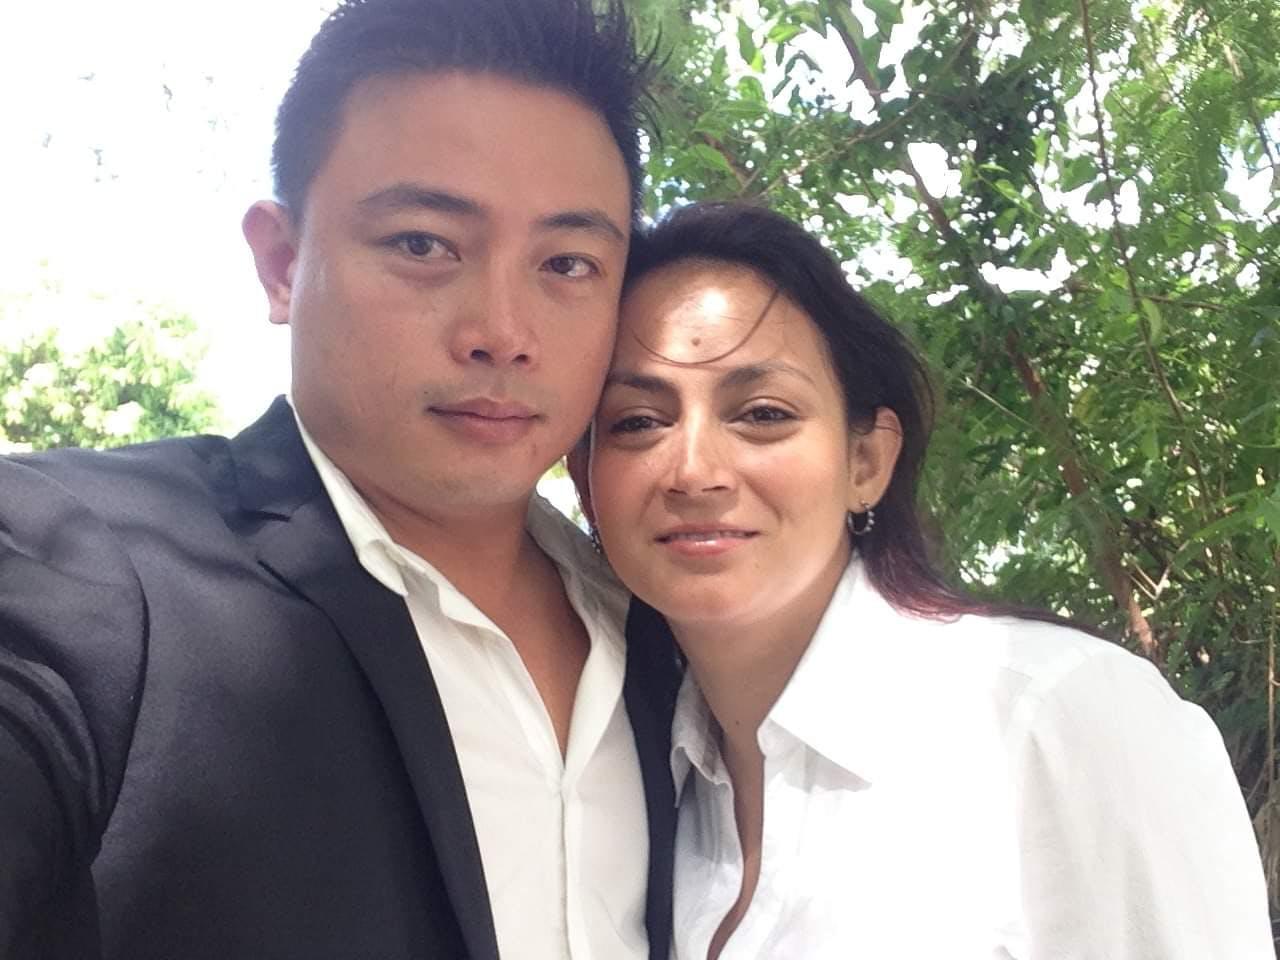 Nhan & Sandra ( Owner of Super Nail Day Spa )